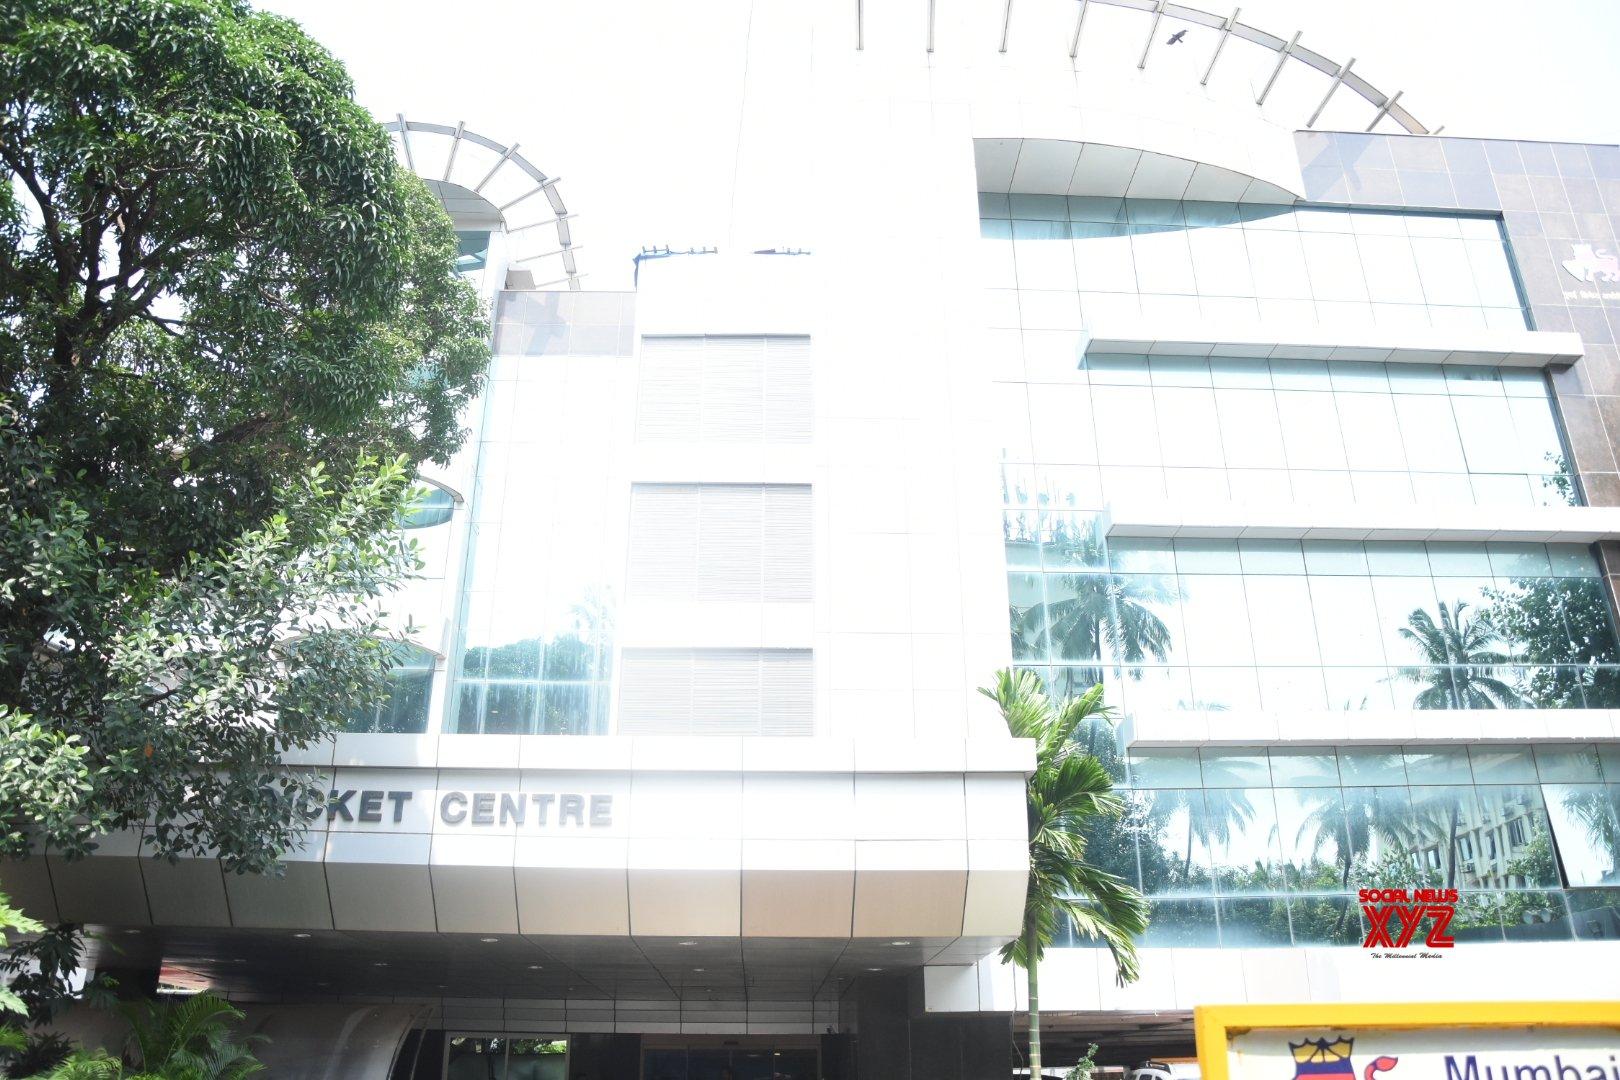 BCCI Apex Council meet: Domestic cricket, ICC tax issue on agenda